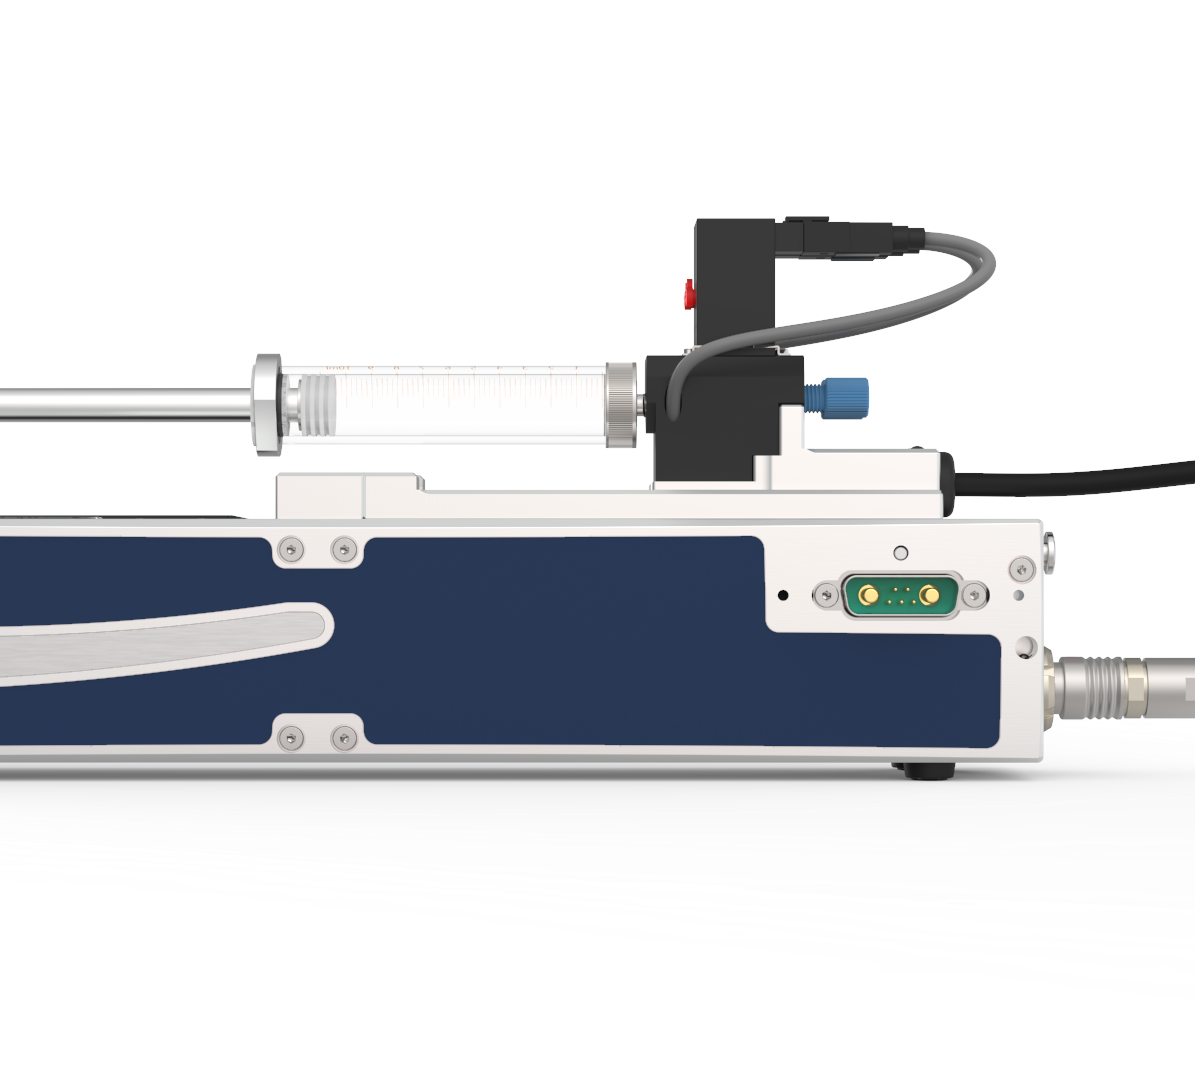 CETONI Nemesys S Flow System, pulsation-free syringe pump